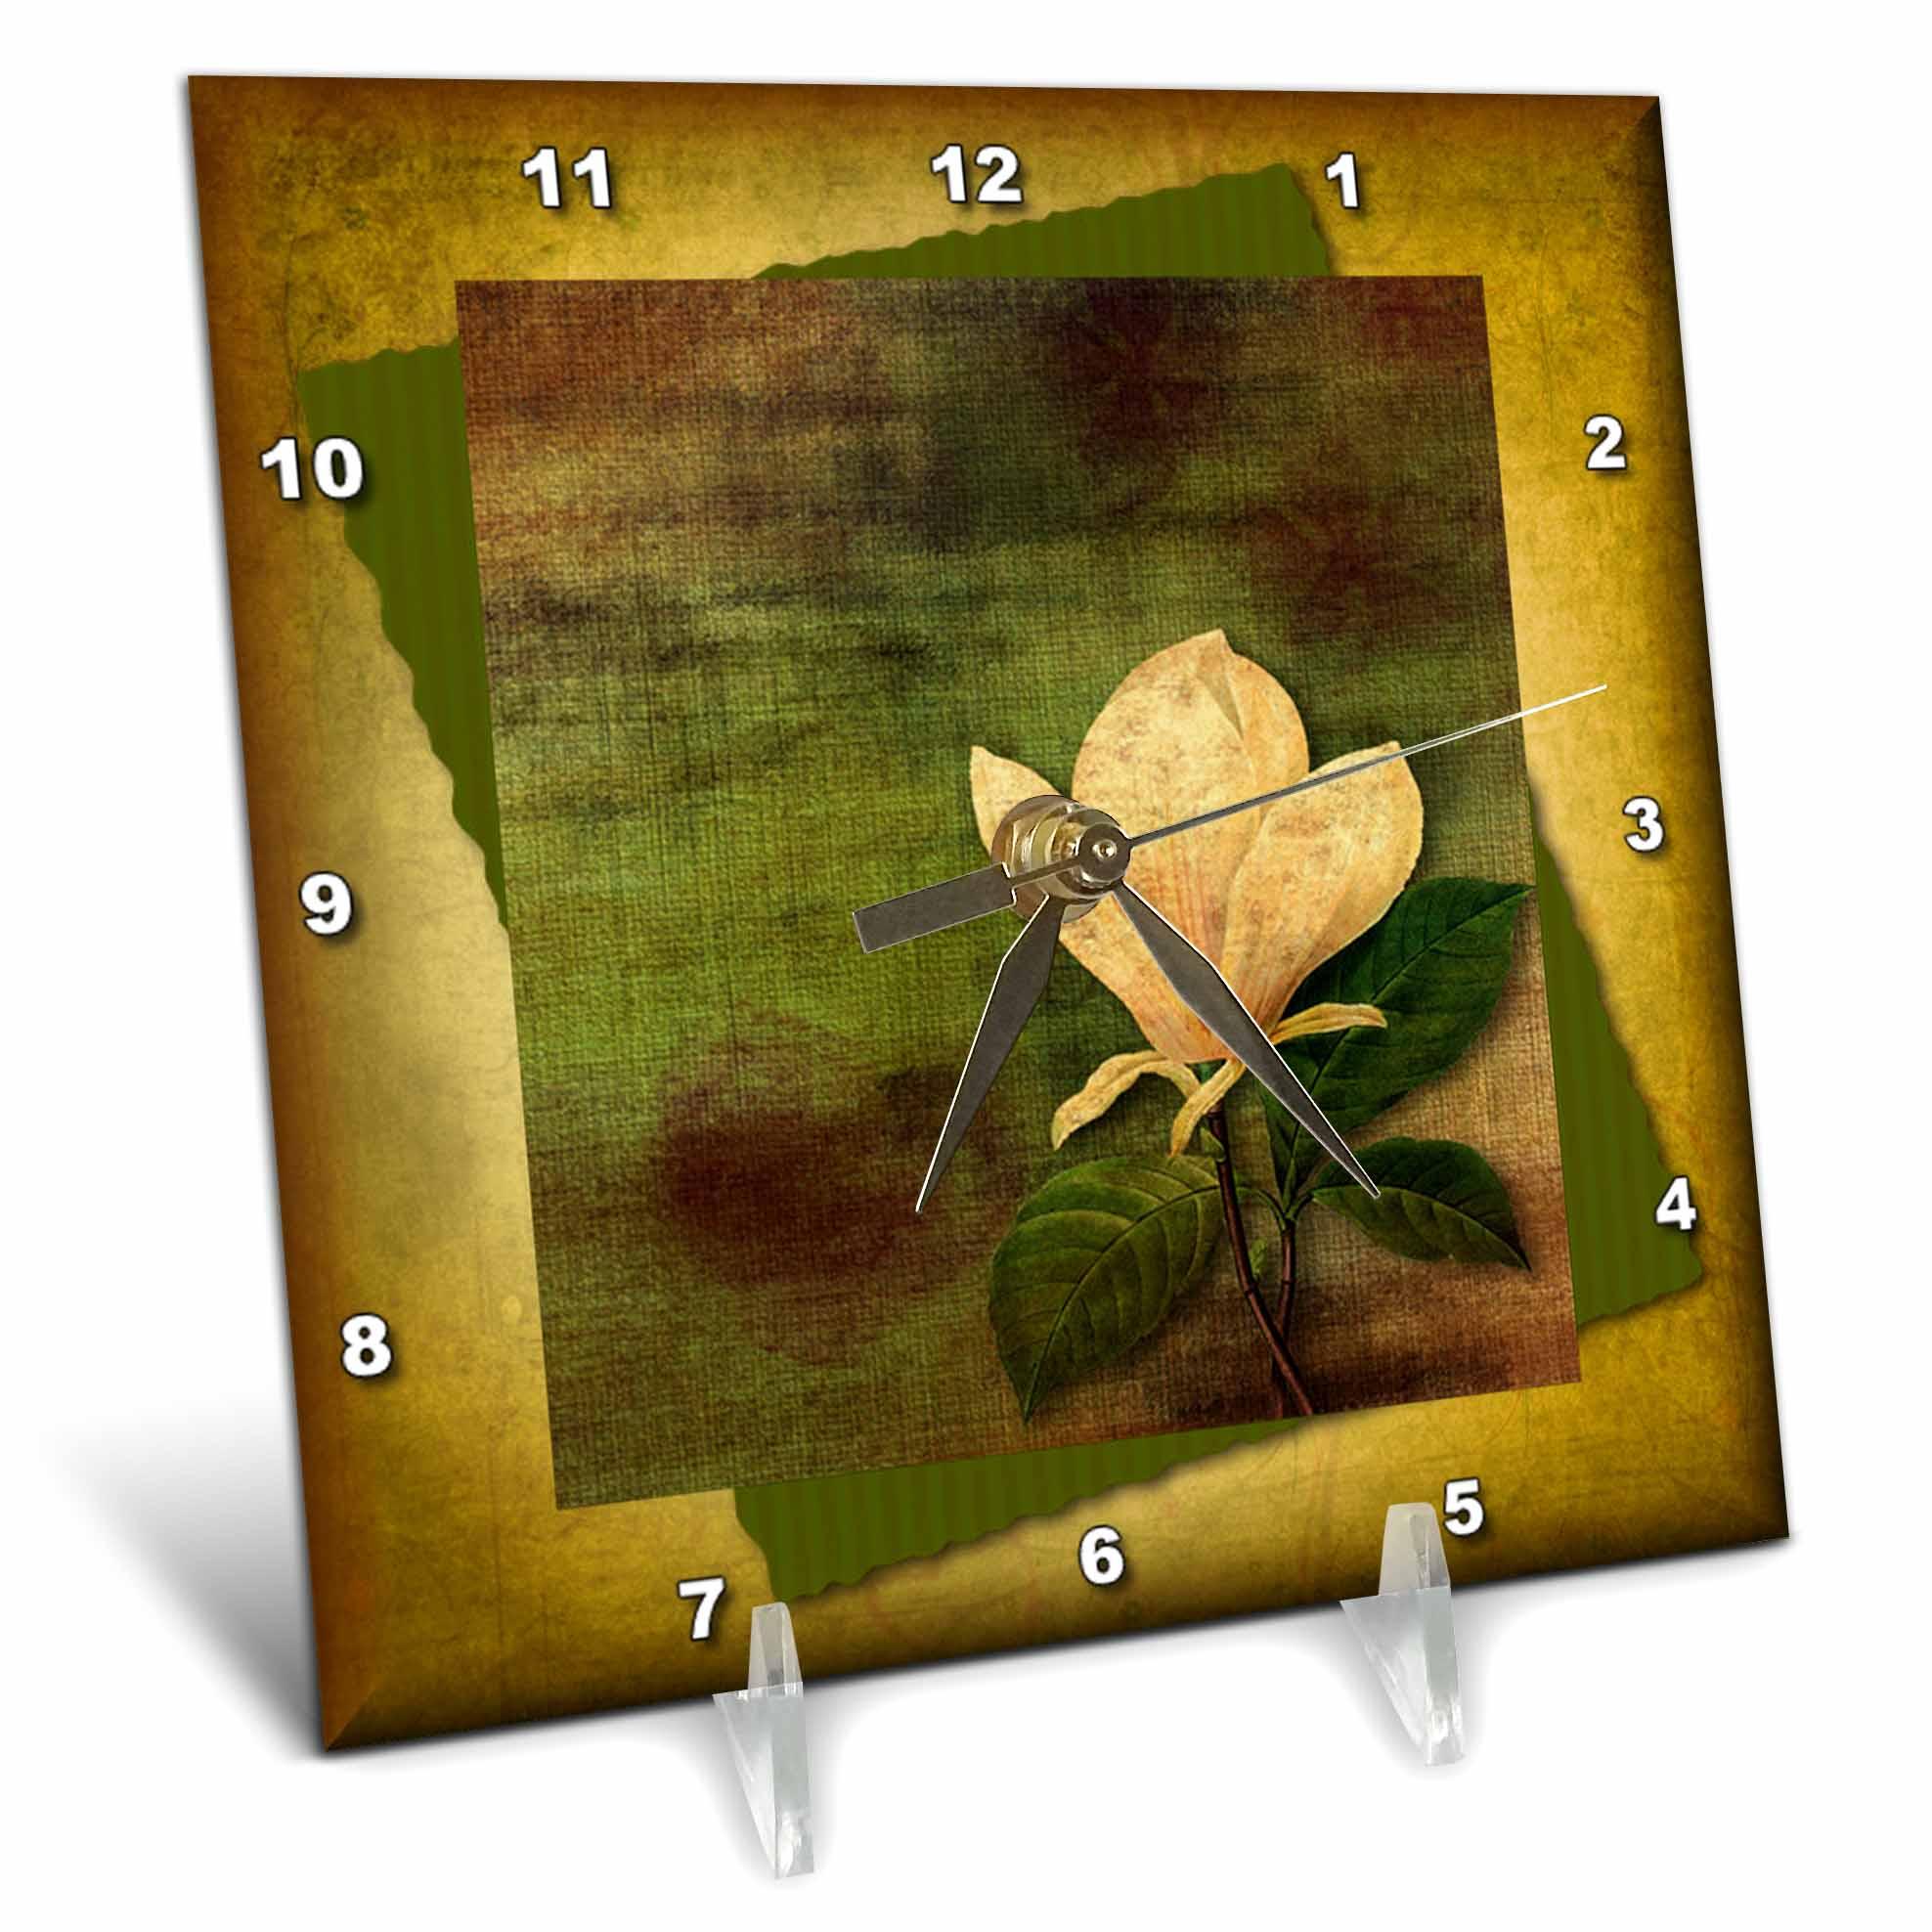 3dRose Vintage Magnolia, Desk Clock, 6 by 6-inch by 3dRose